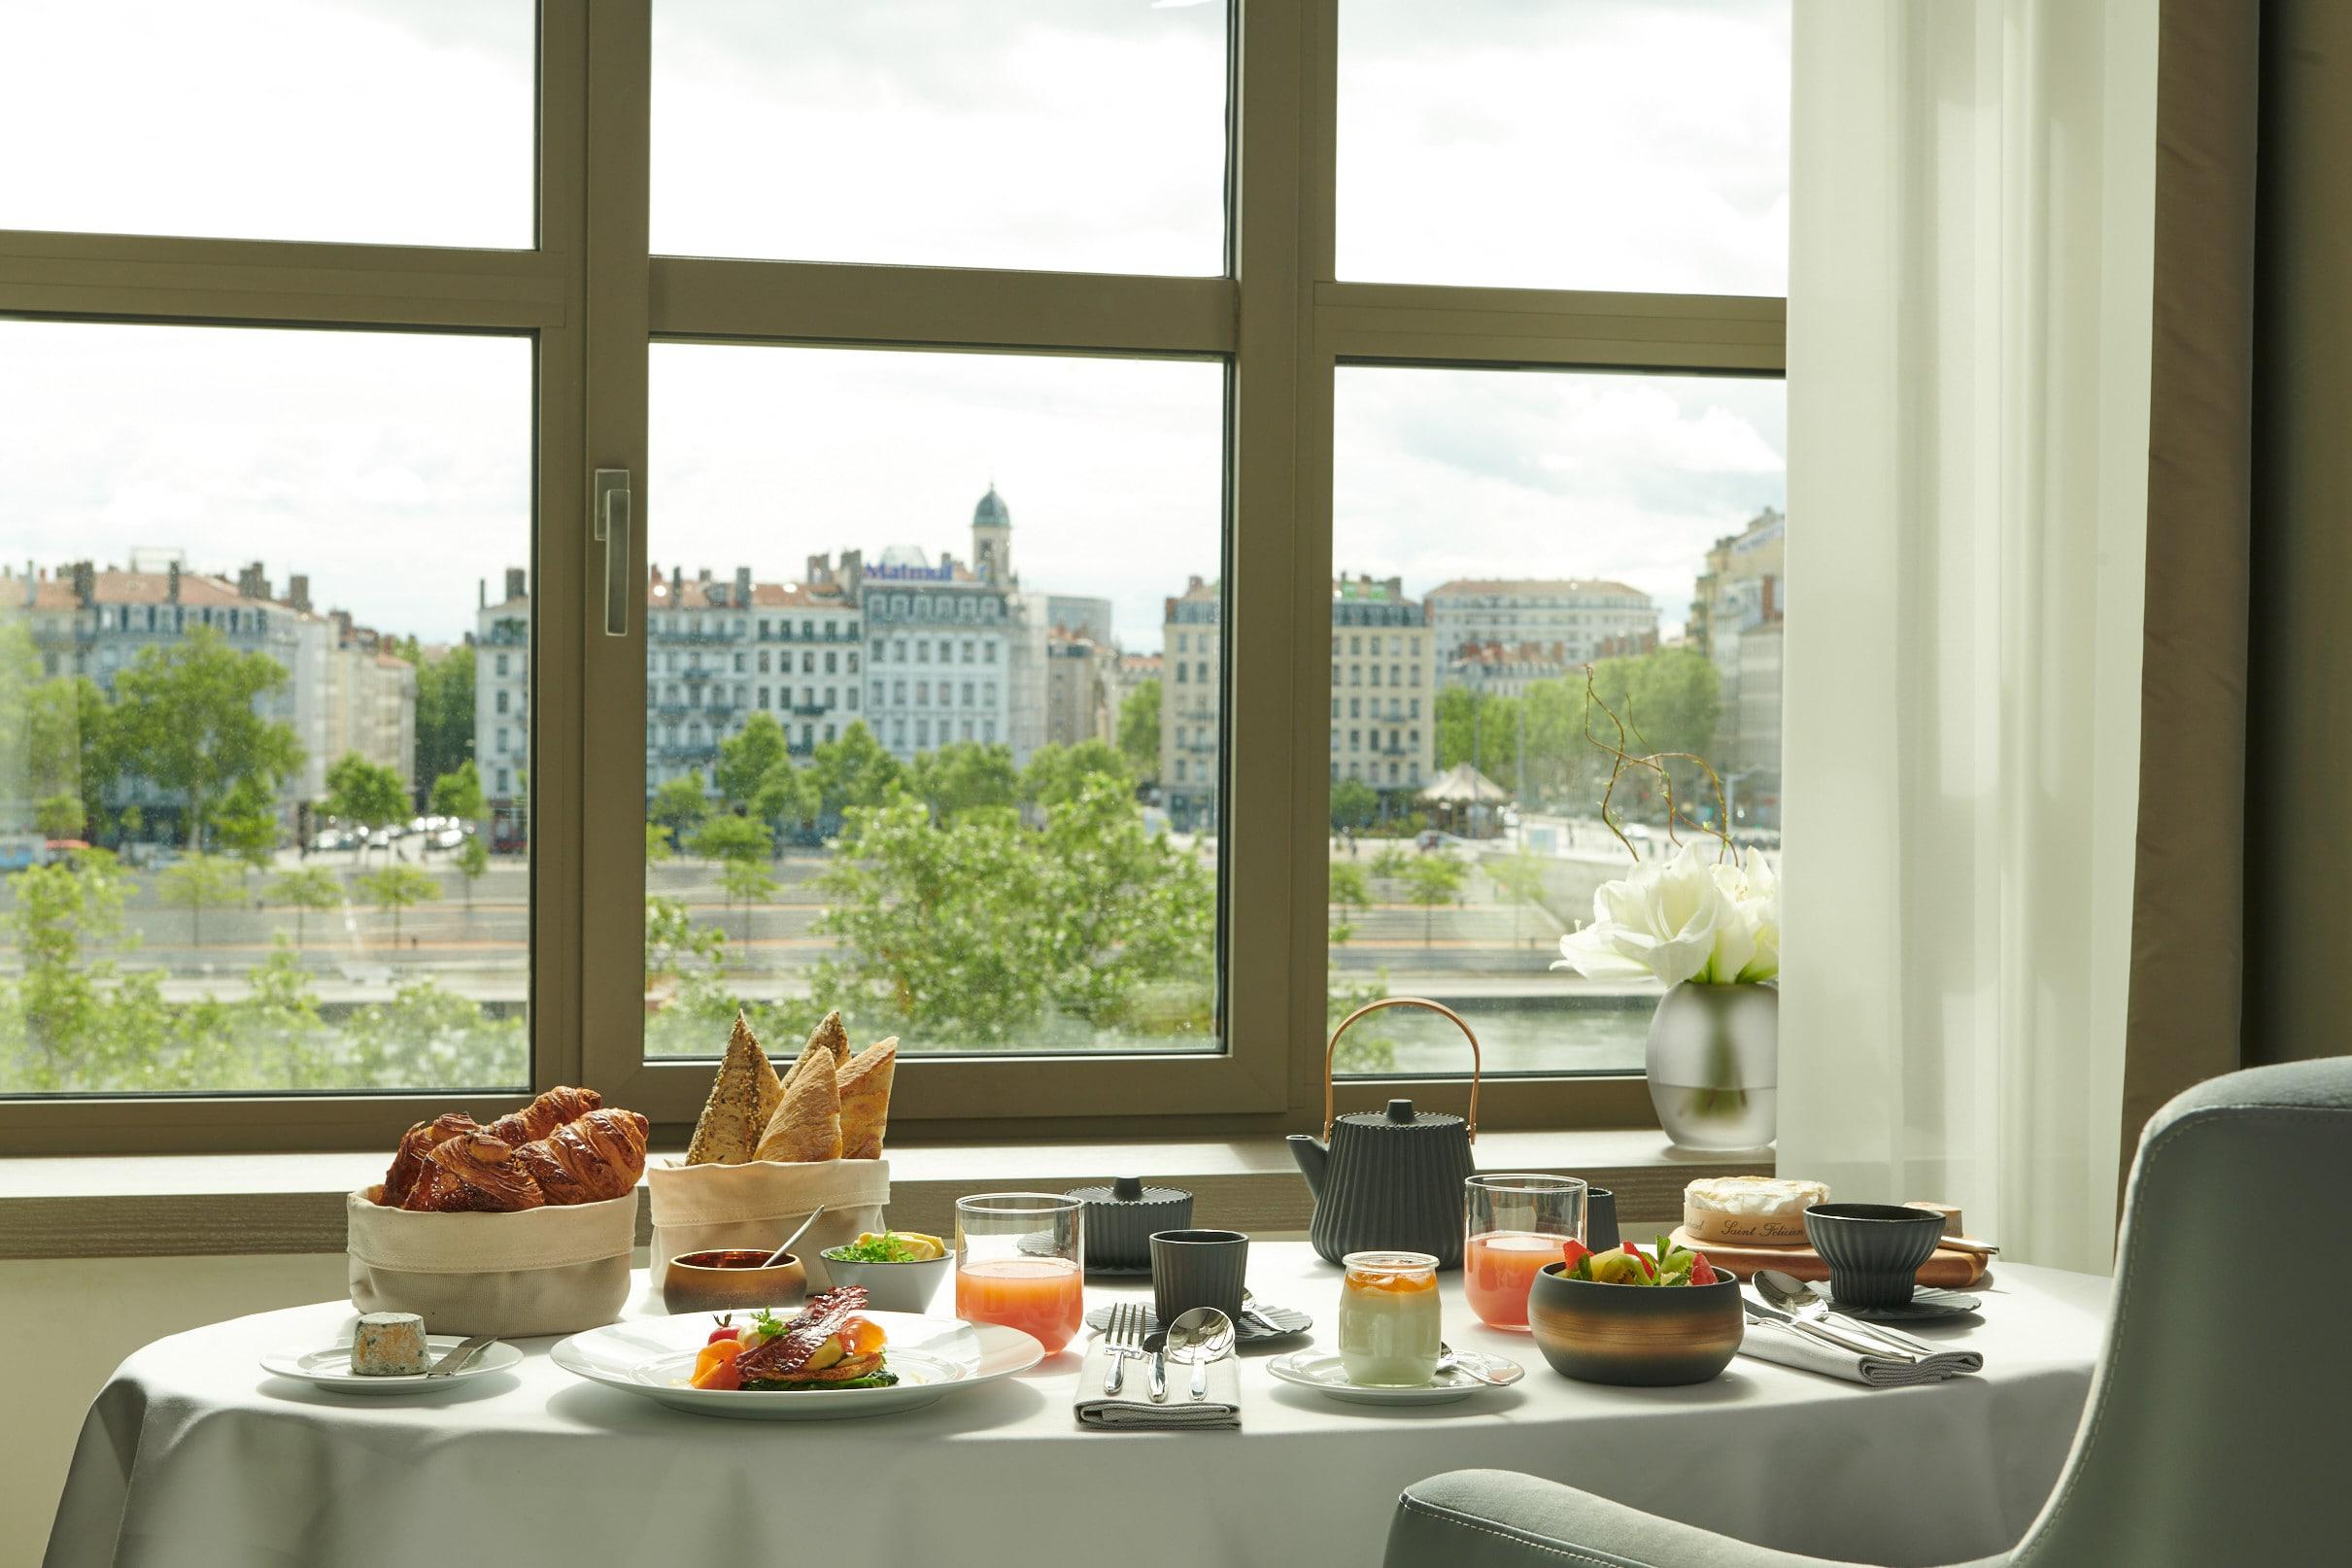 InterContinental Lyon - Hotel Dieu - room service - petit-dejeuner - vue Rhone